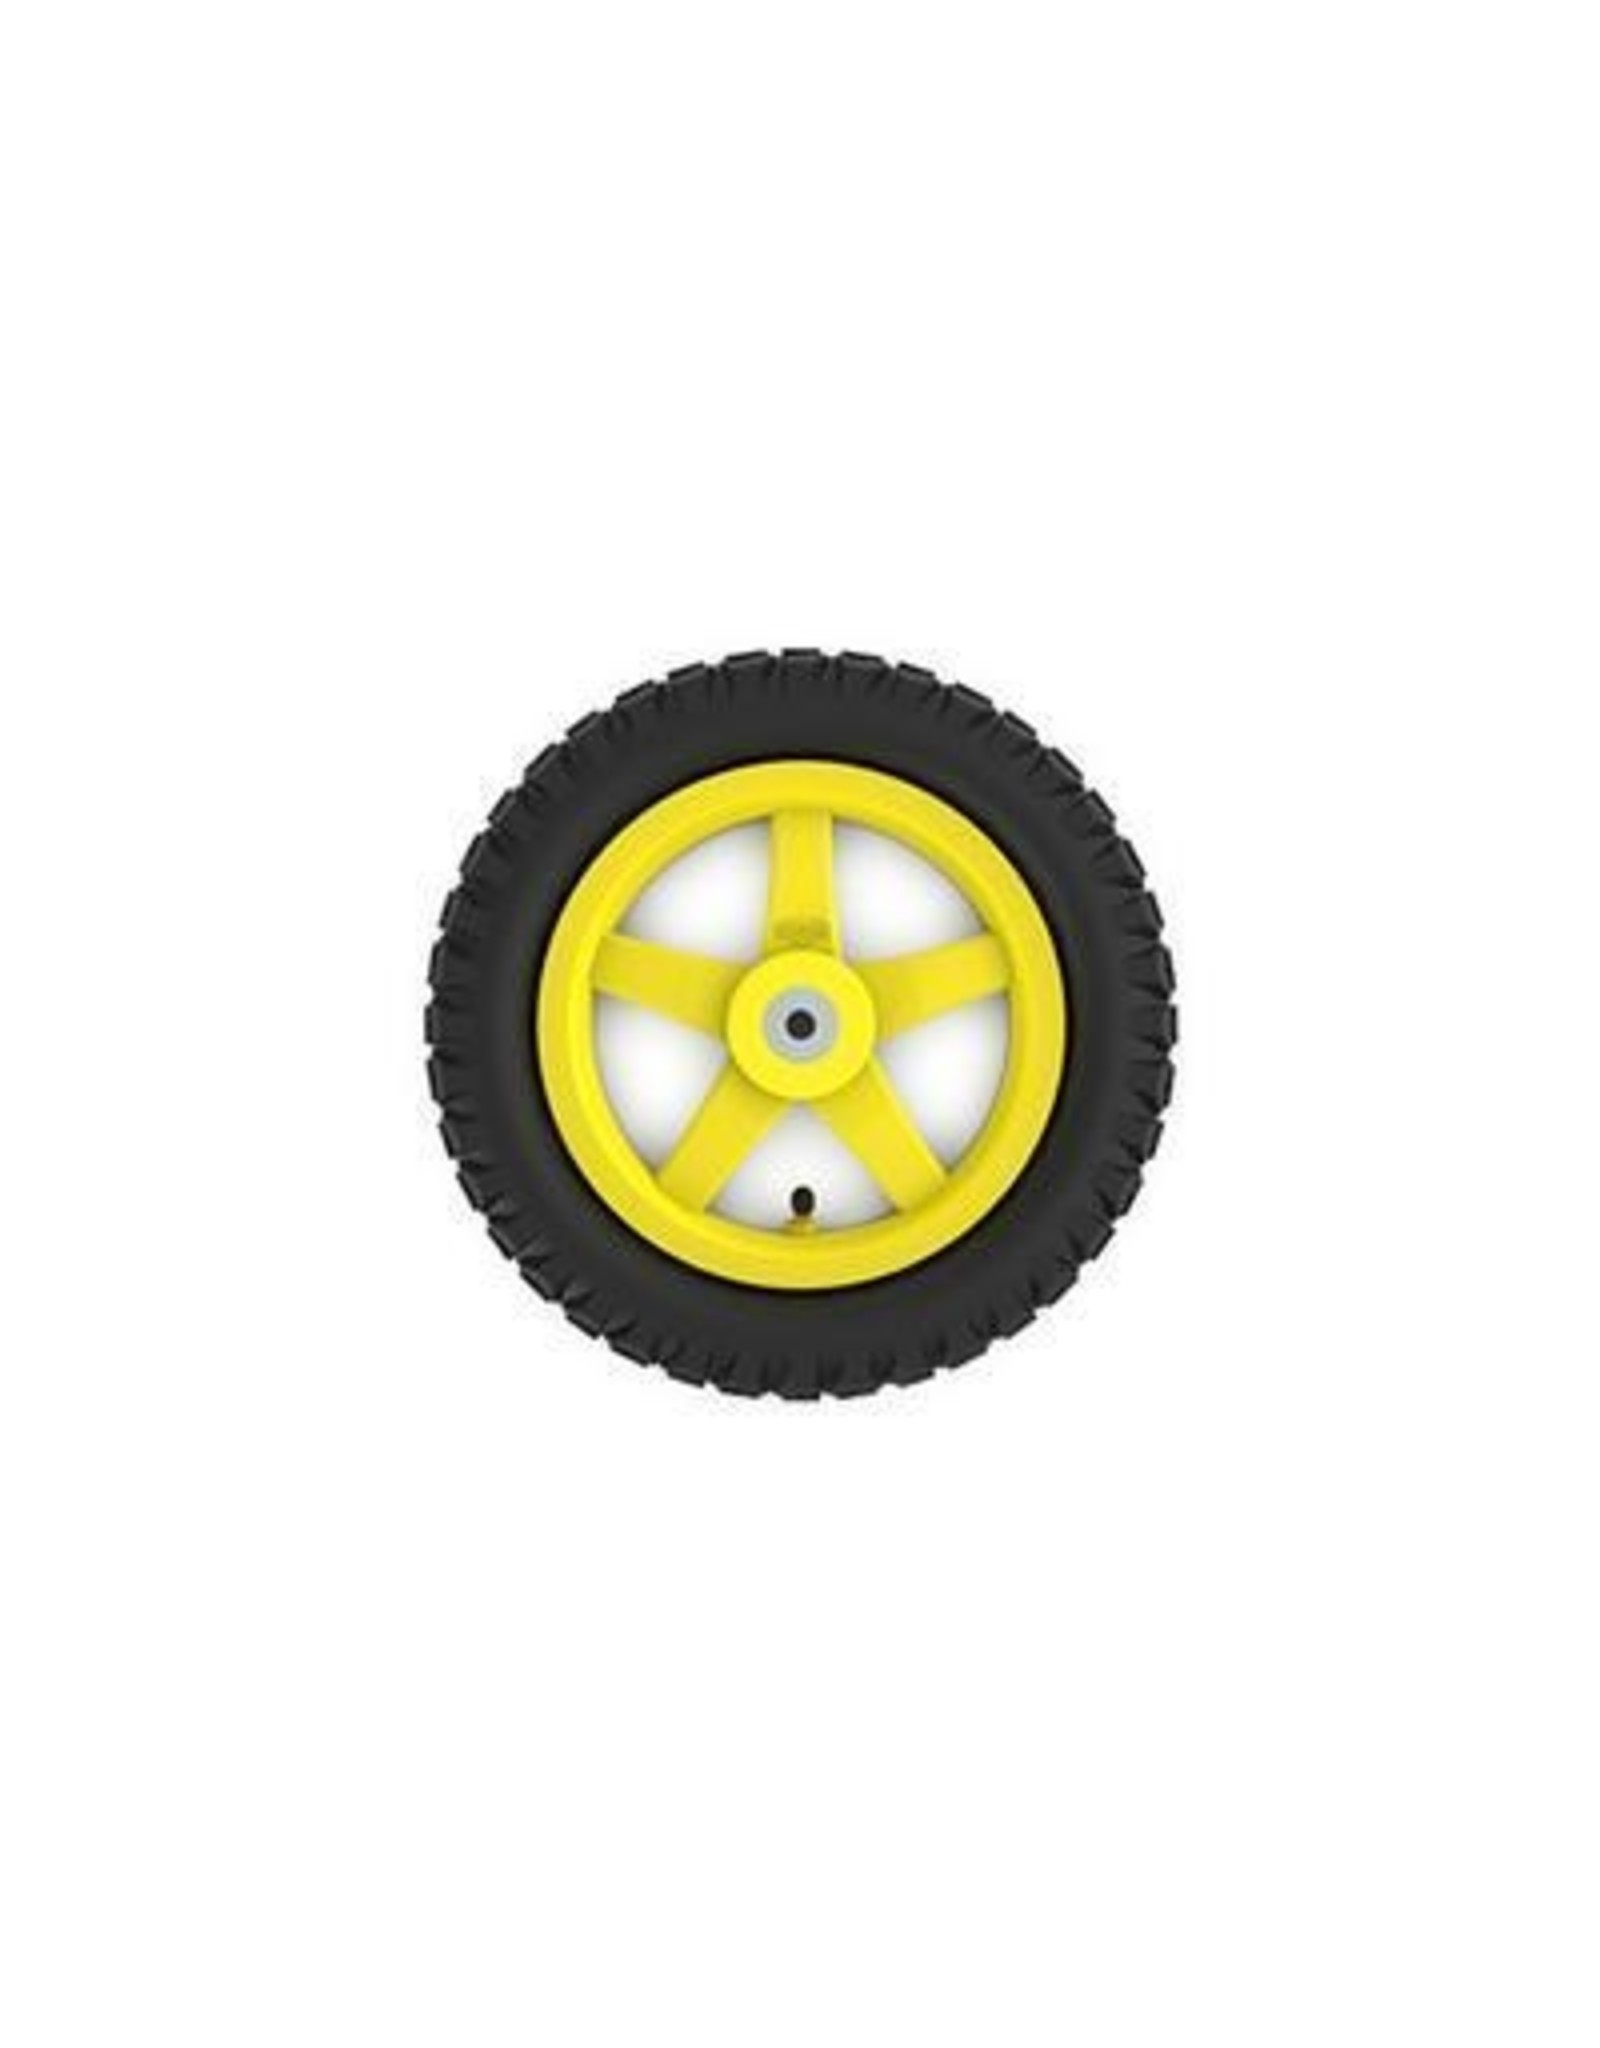 BERG BERG Buddy wiel 12,5X8 geel Cross